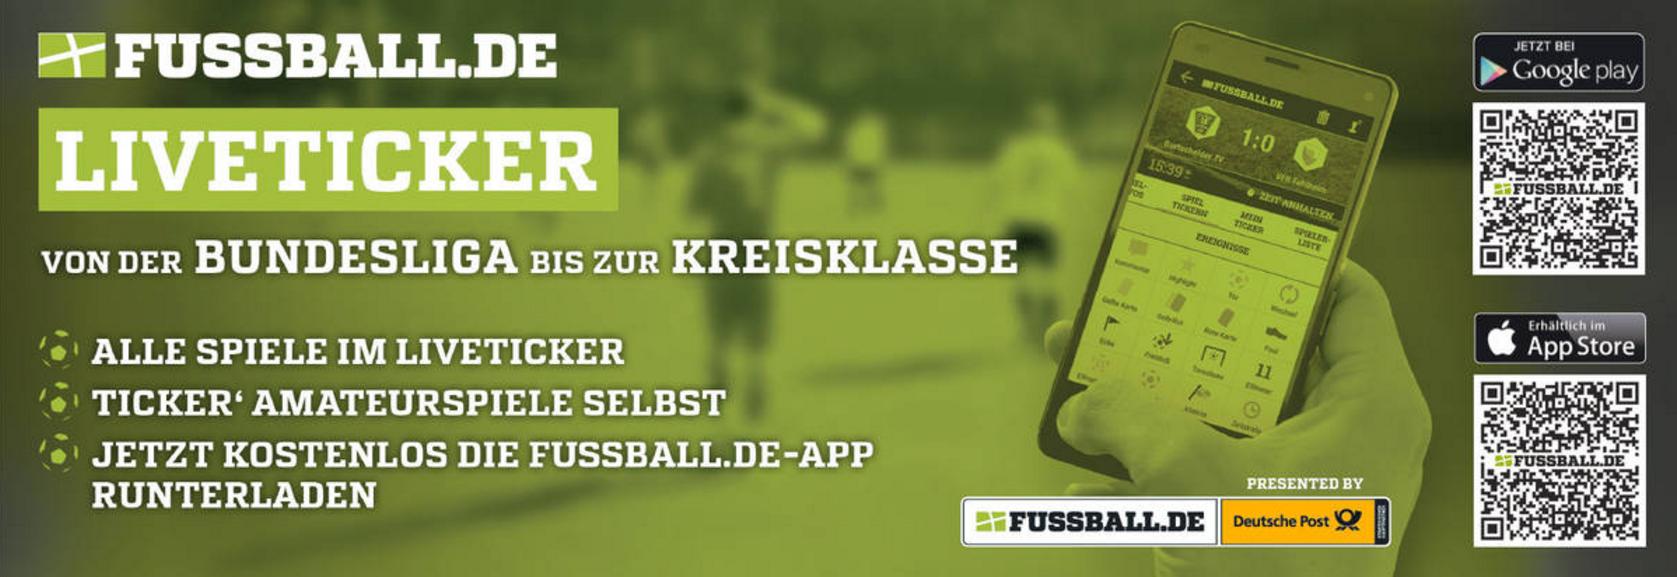 Fussball De Liveticker 2 Fc Rottenburg 1946 E V